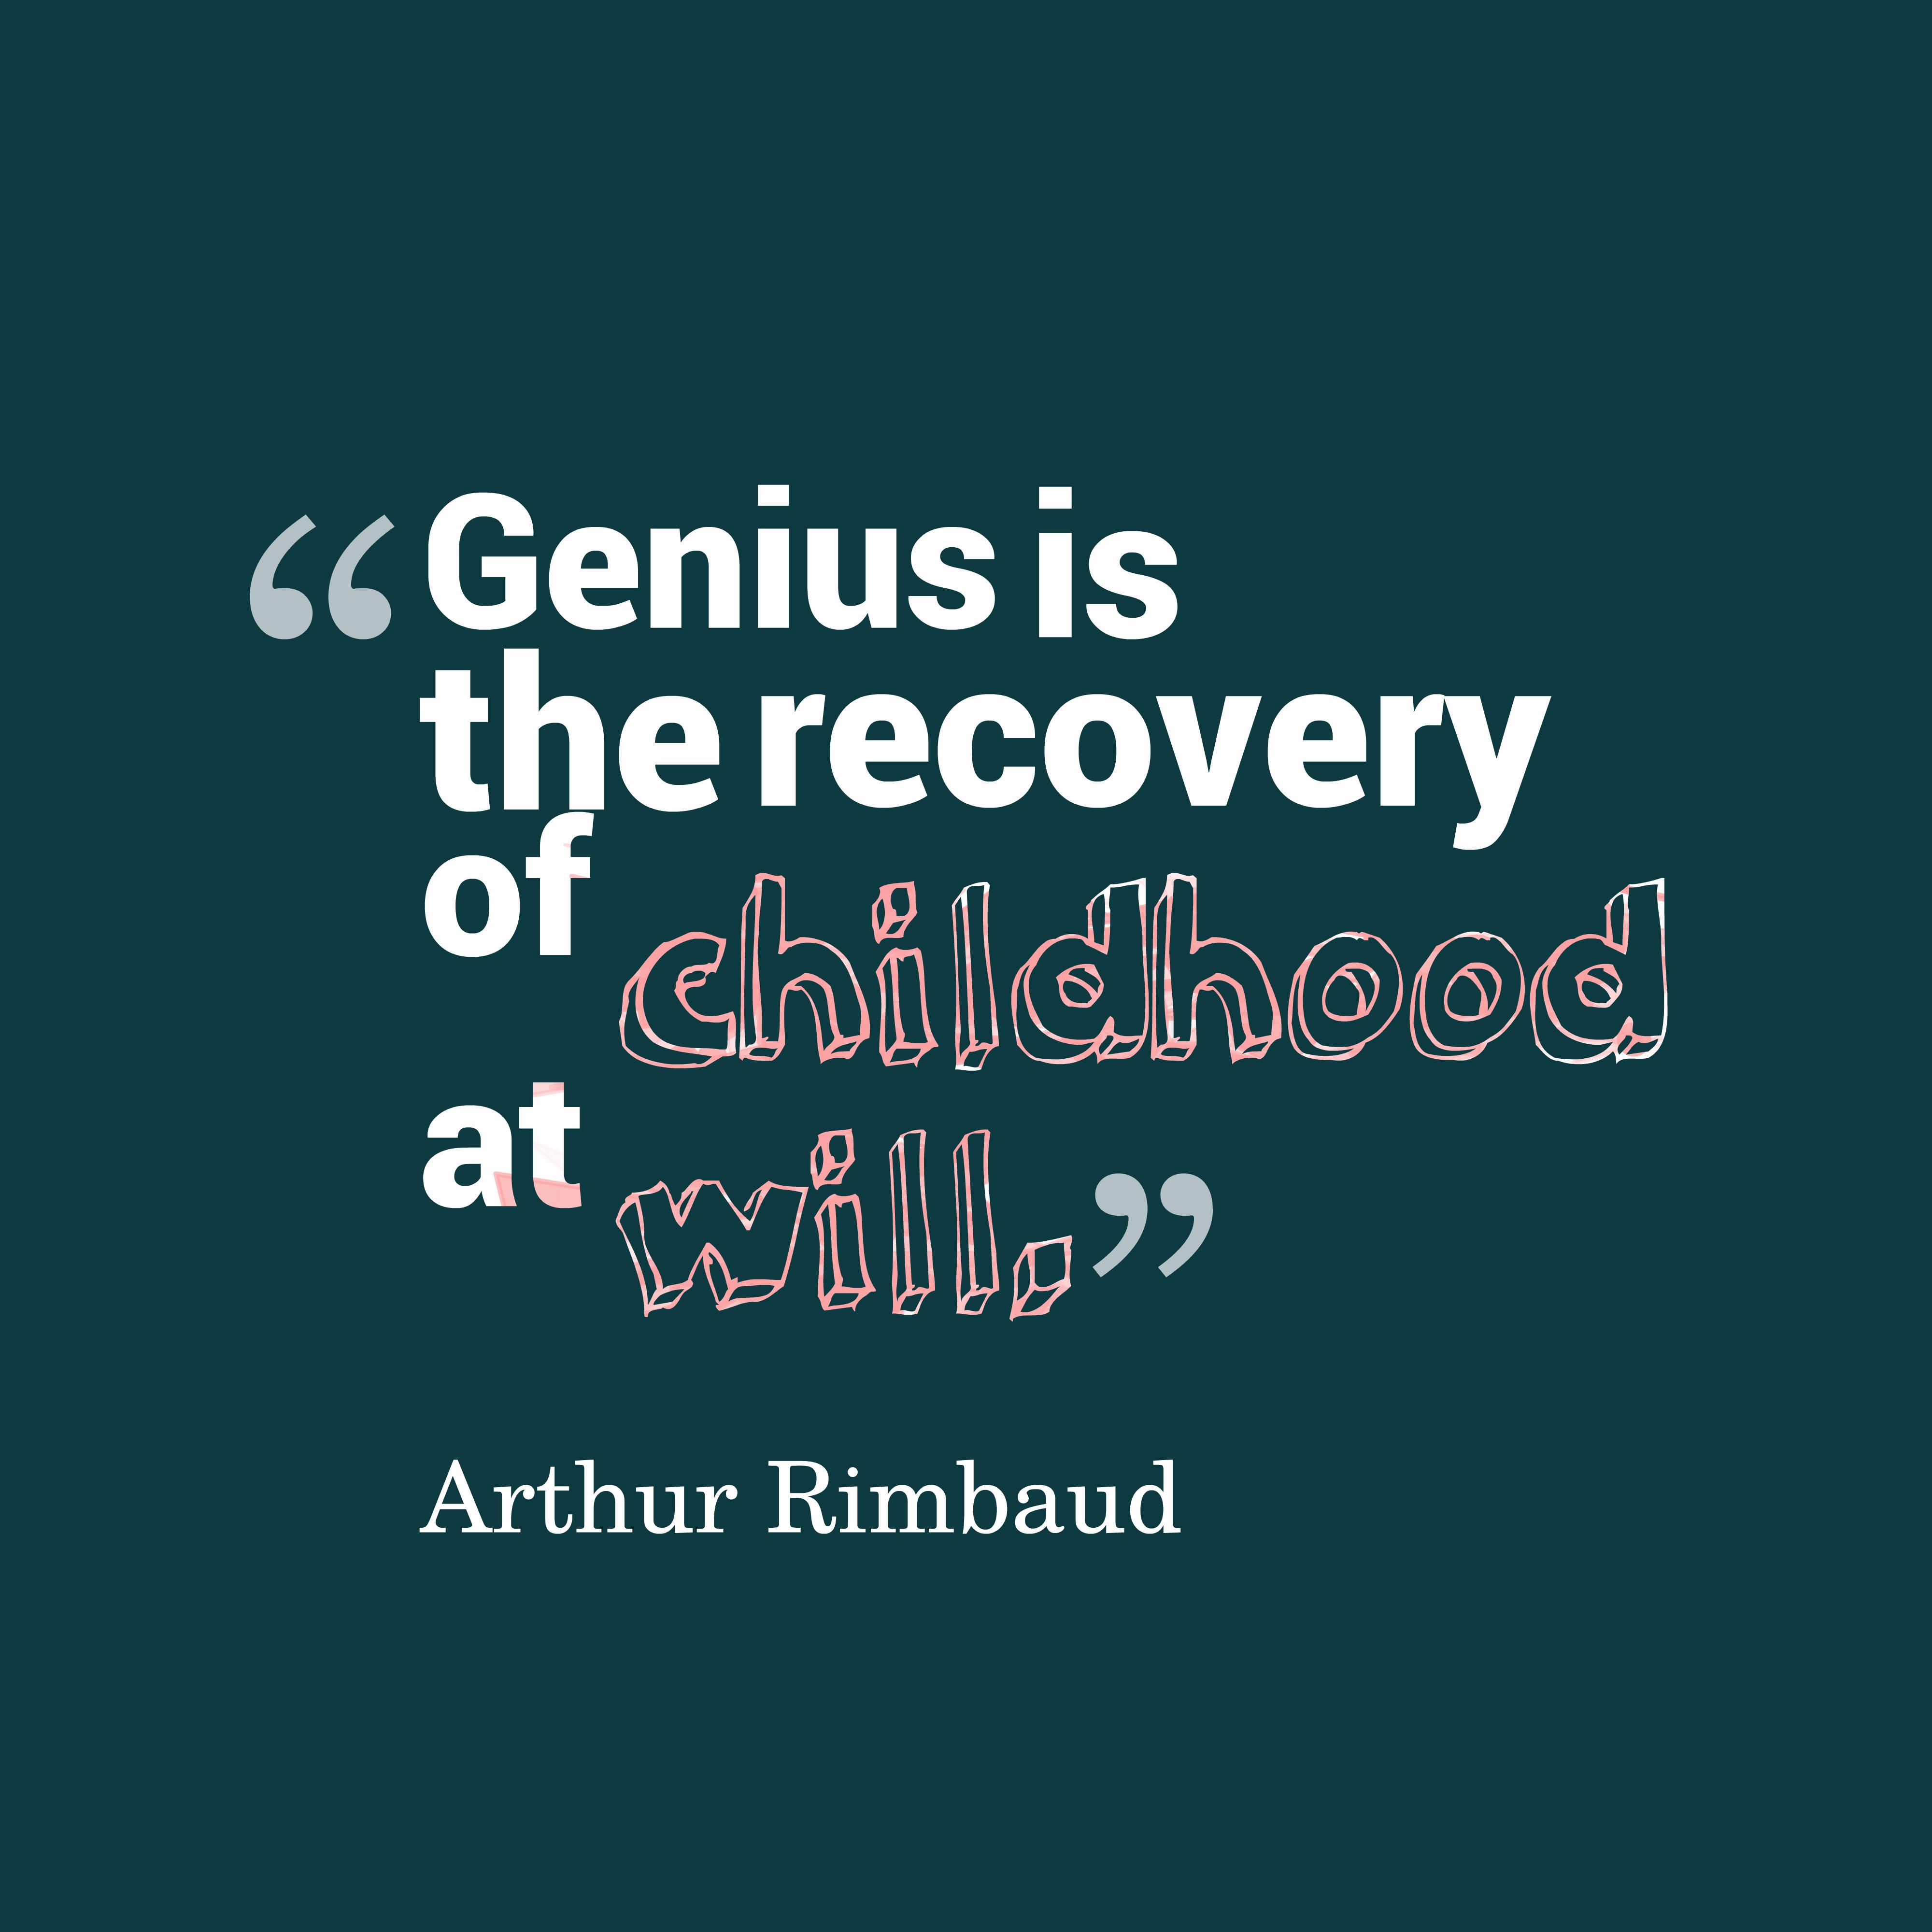 Picture Arthur Rimbaud...